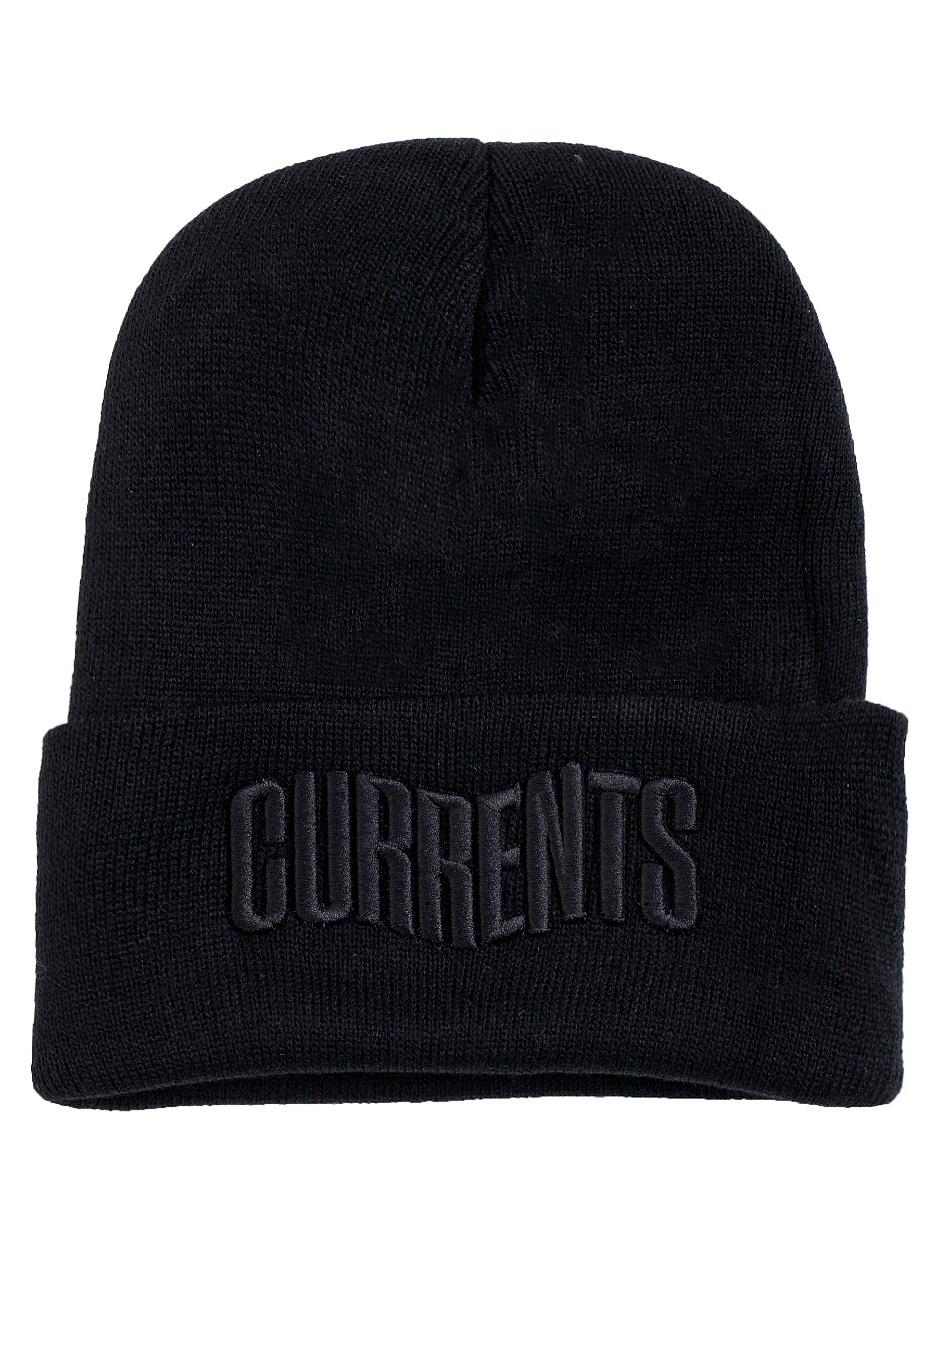 Currents - Wavy Logo - Beanies